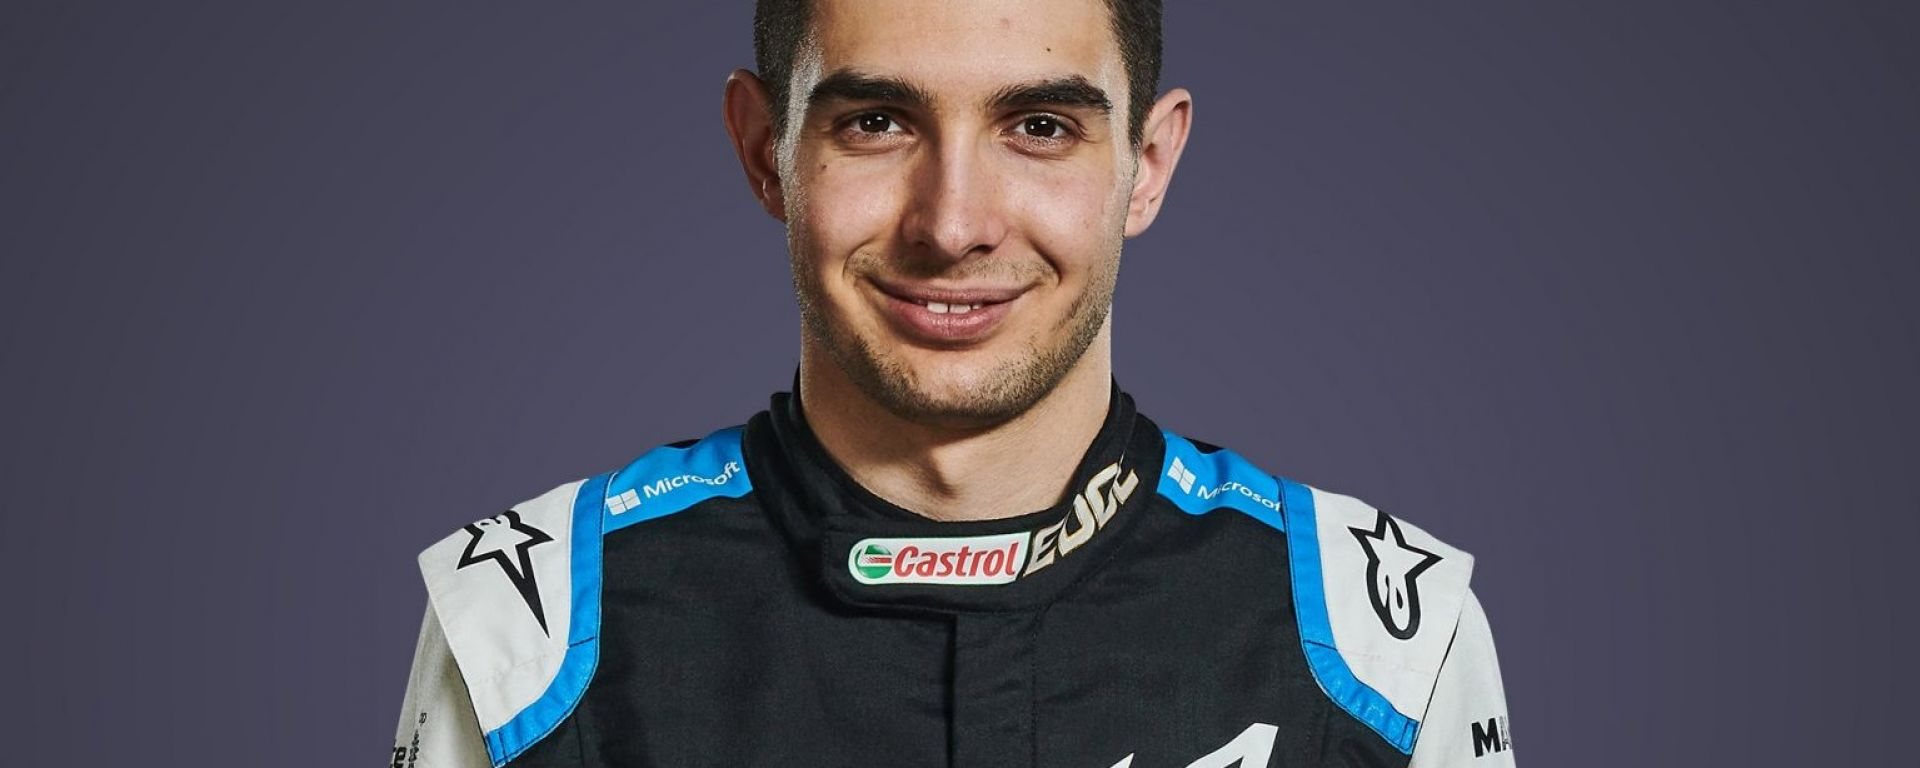 F1 2021: Esteban Ocon (Alpine Renault F1 Team)